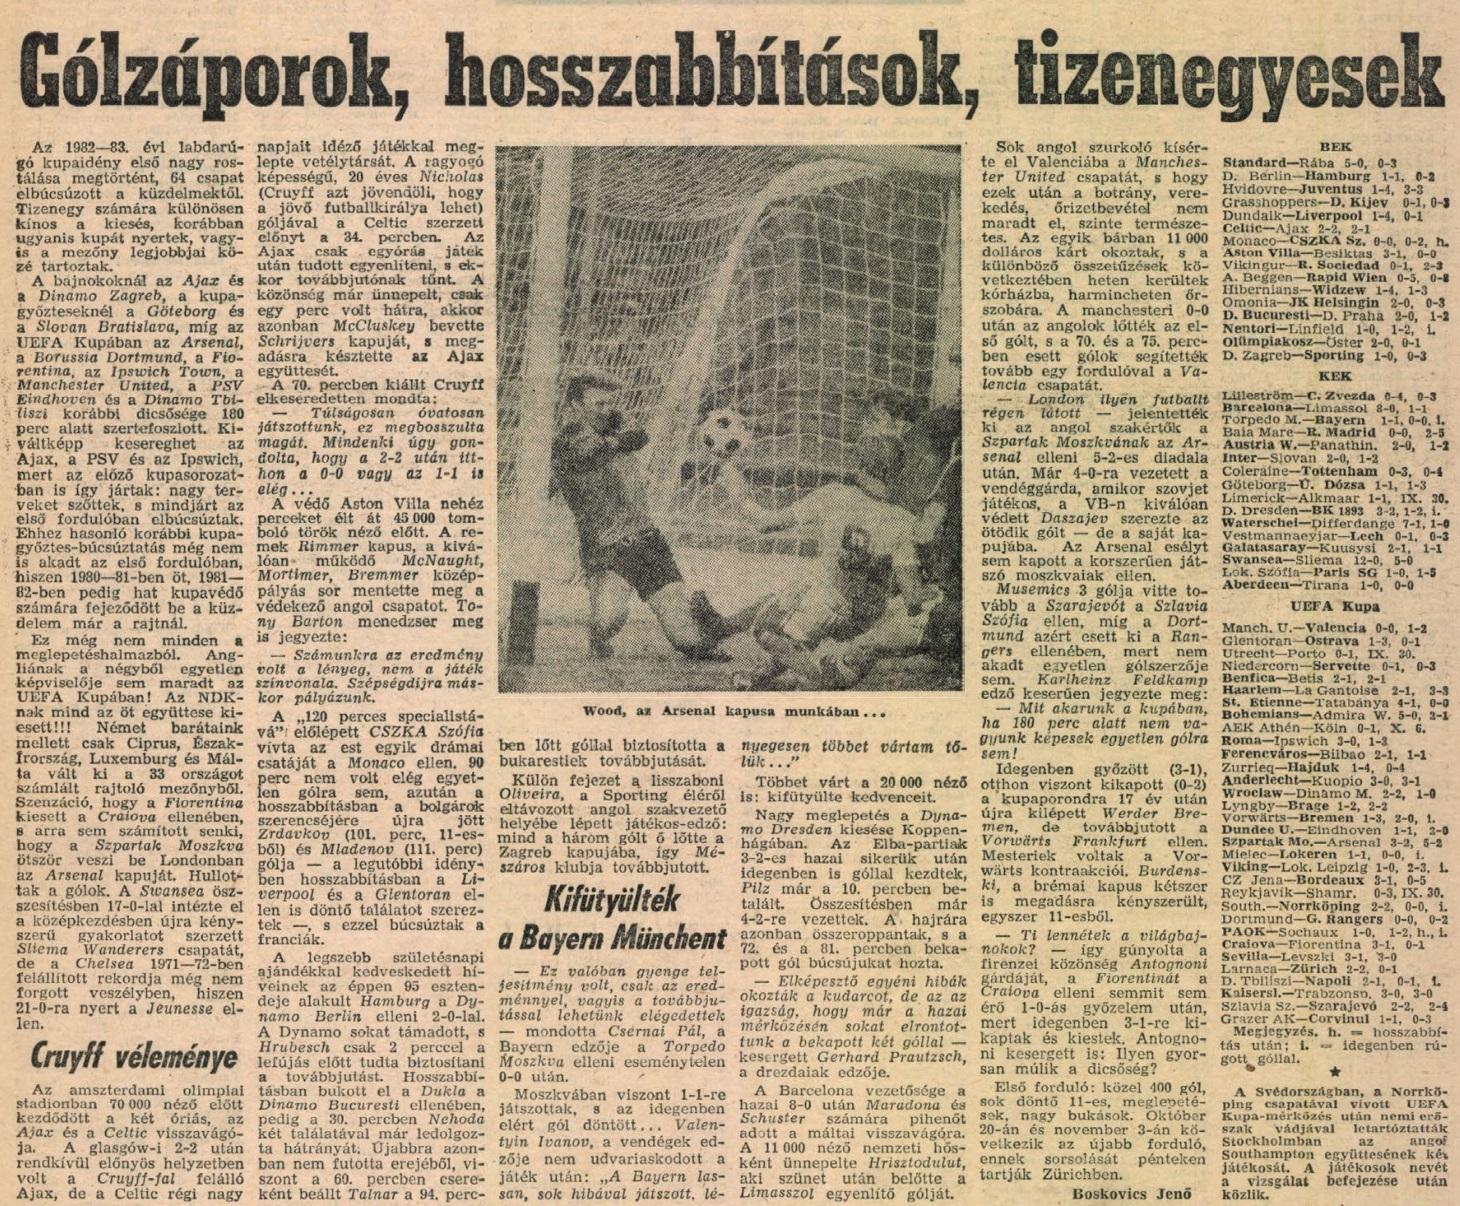 idokapszula_nb_i_1982_83_klubcsapataink_nemzetkozi_kupaszereplese_1_fordulo_2_kor_kupaszerda.jpg